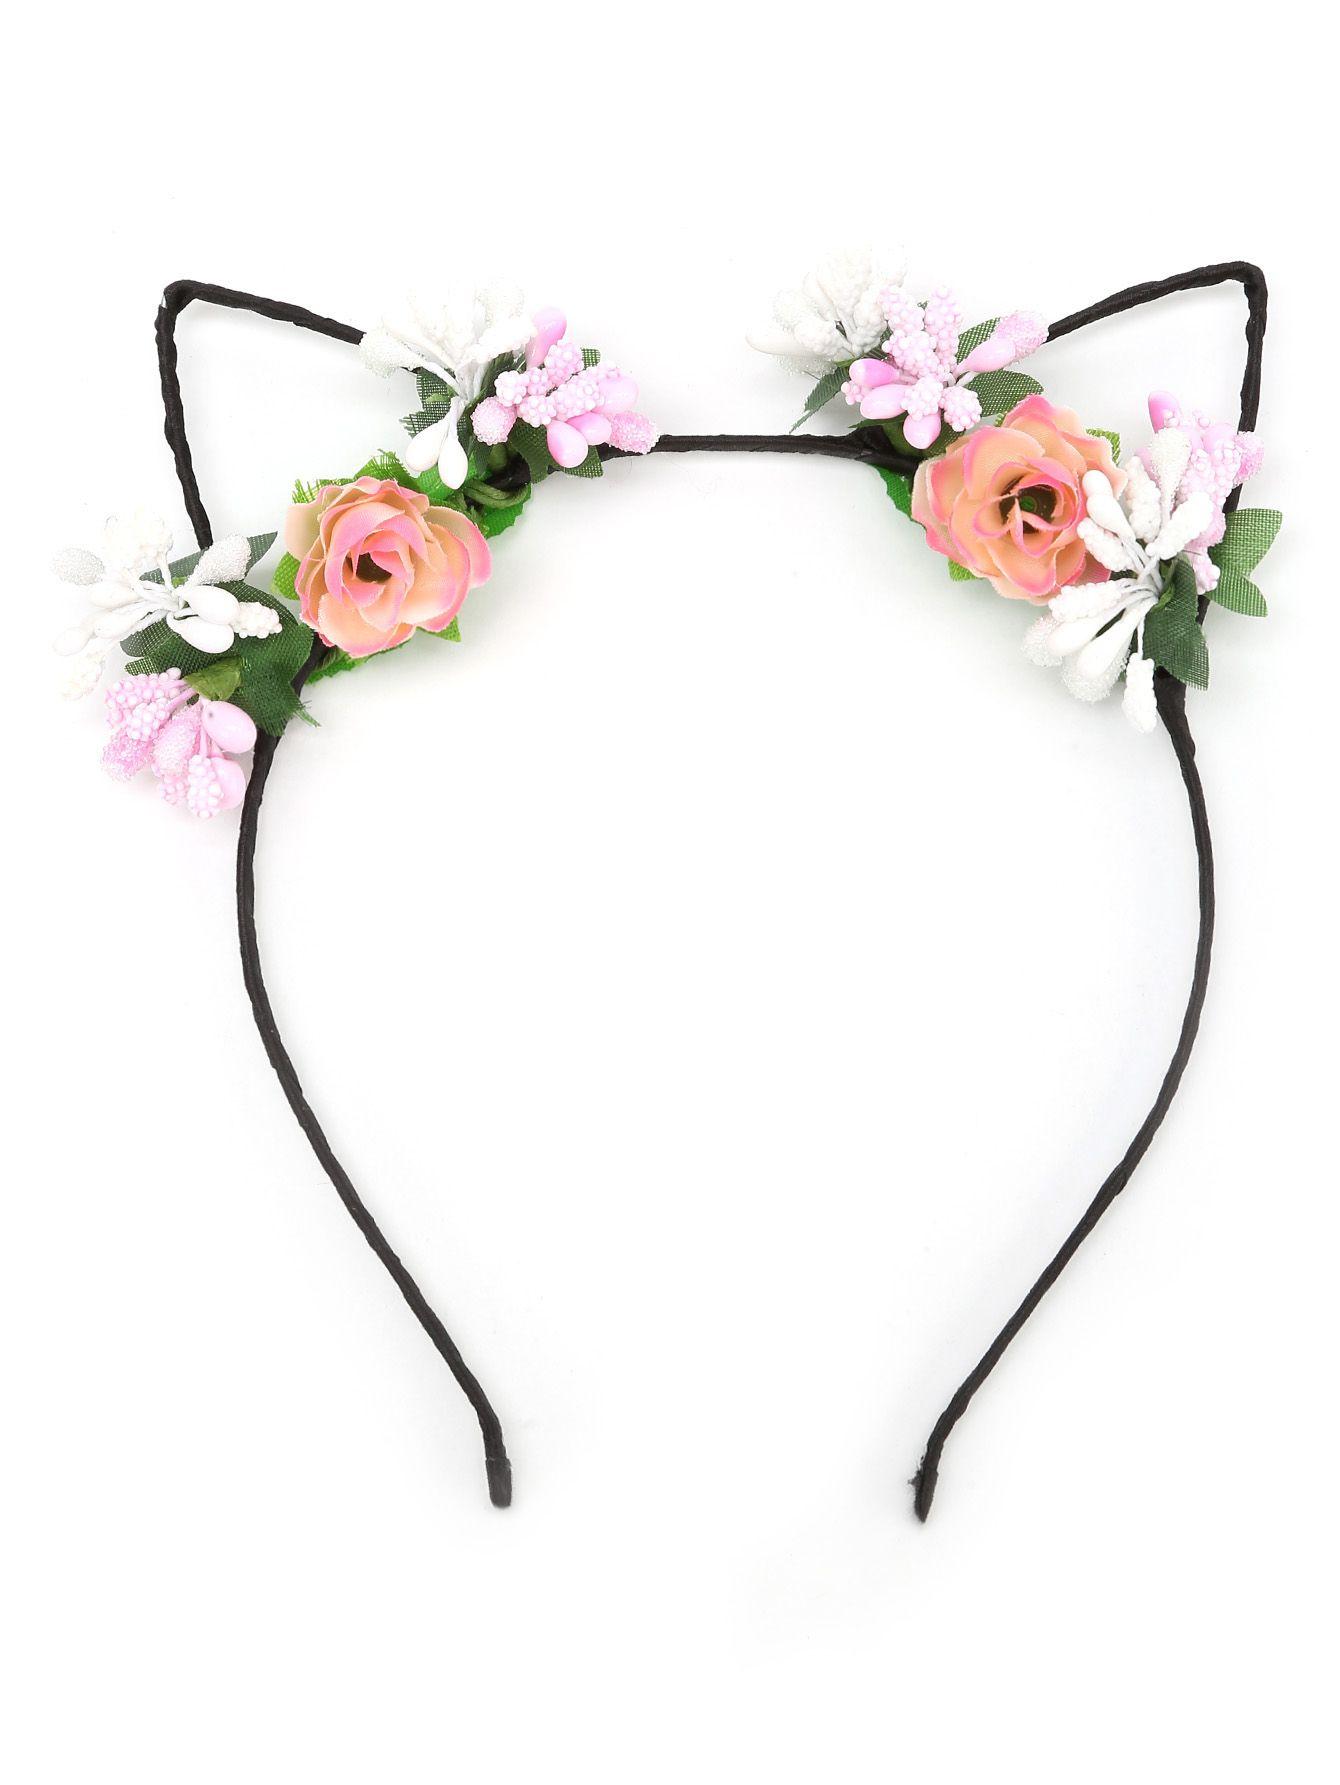 Diadema con oreja de gato con adornos de flor -Spanish SheIn(Sheinside).  Shop Flower Embellished Cat Ear Headband online. 2daa4afd4bd